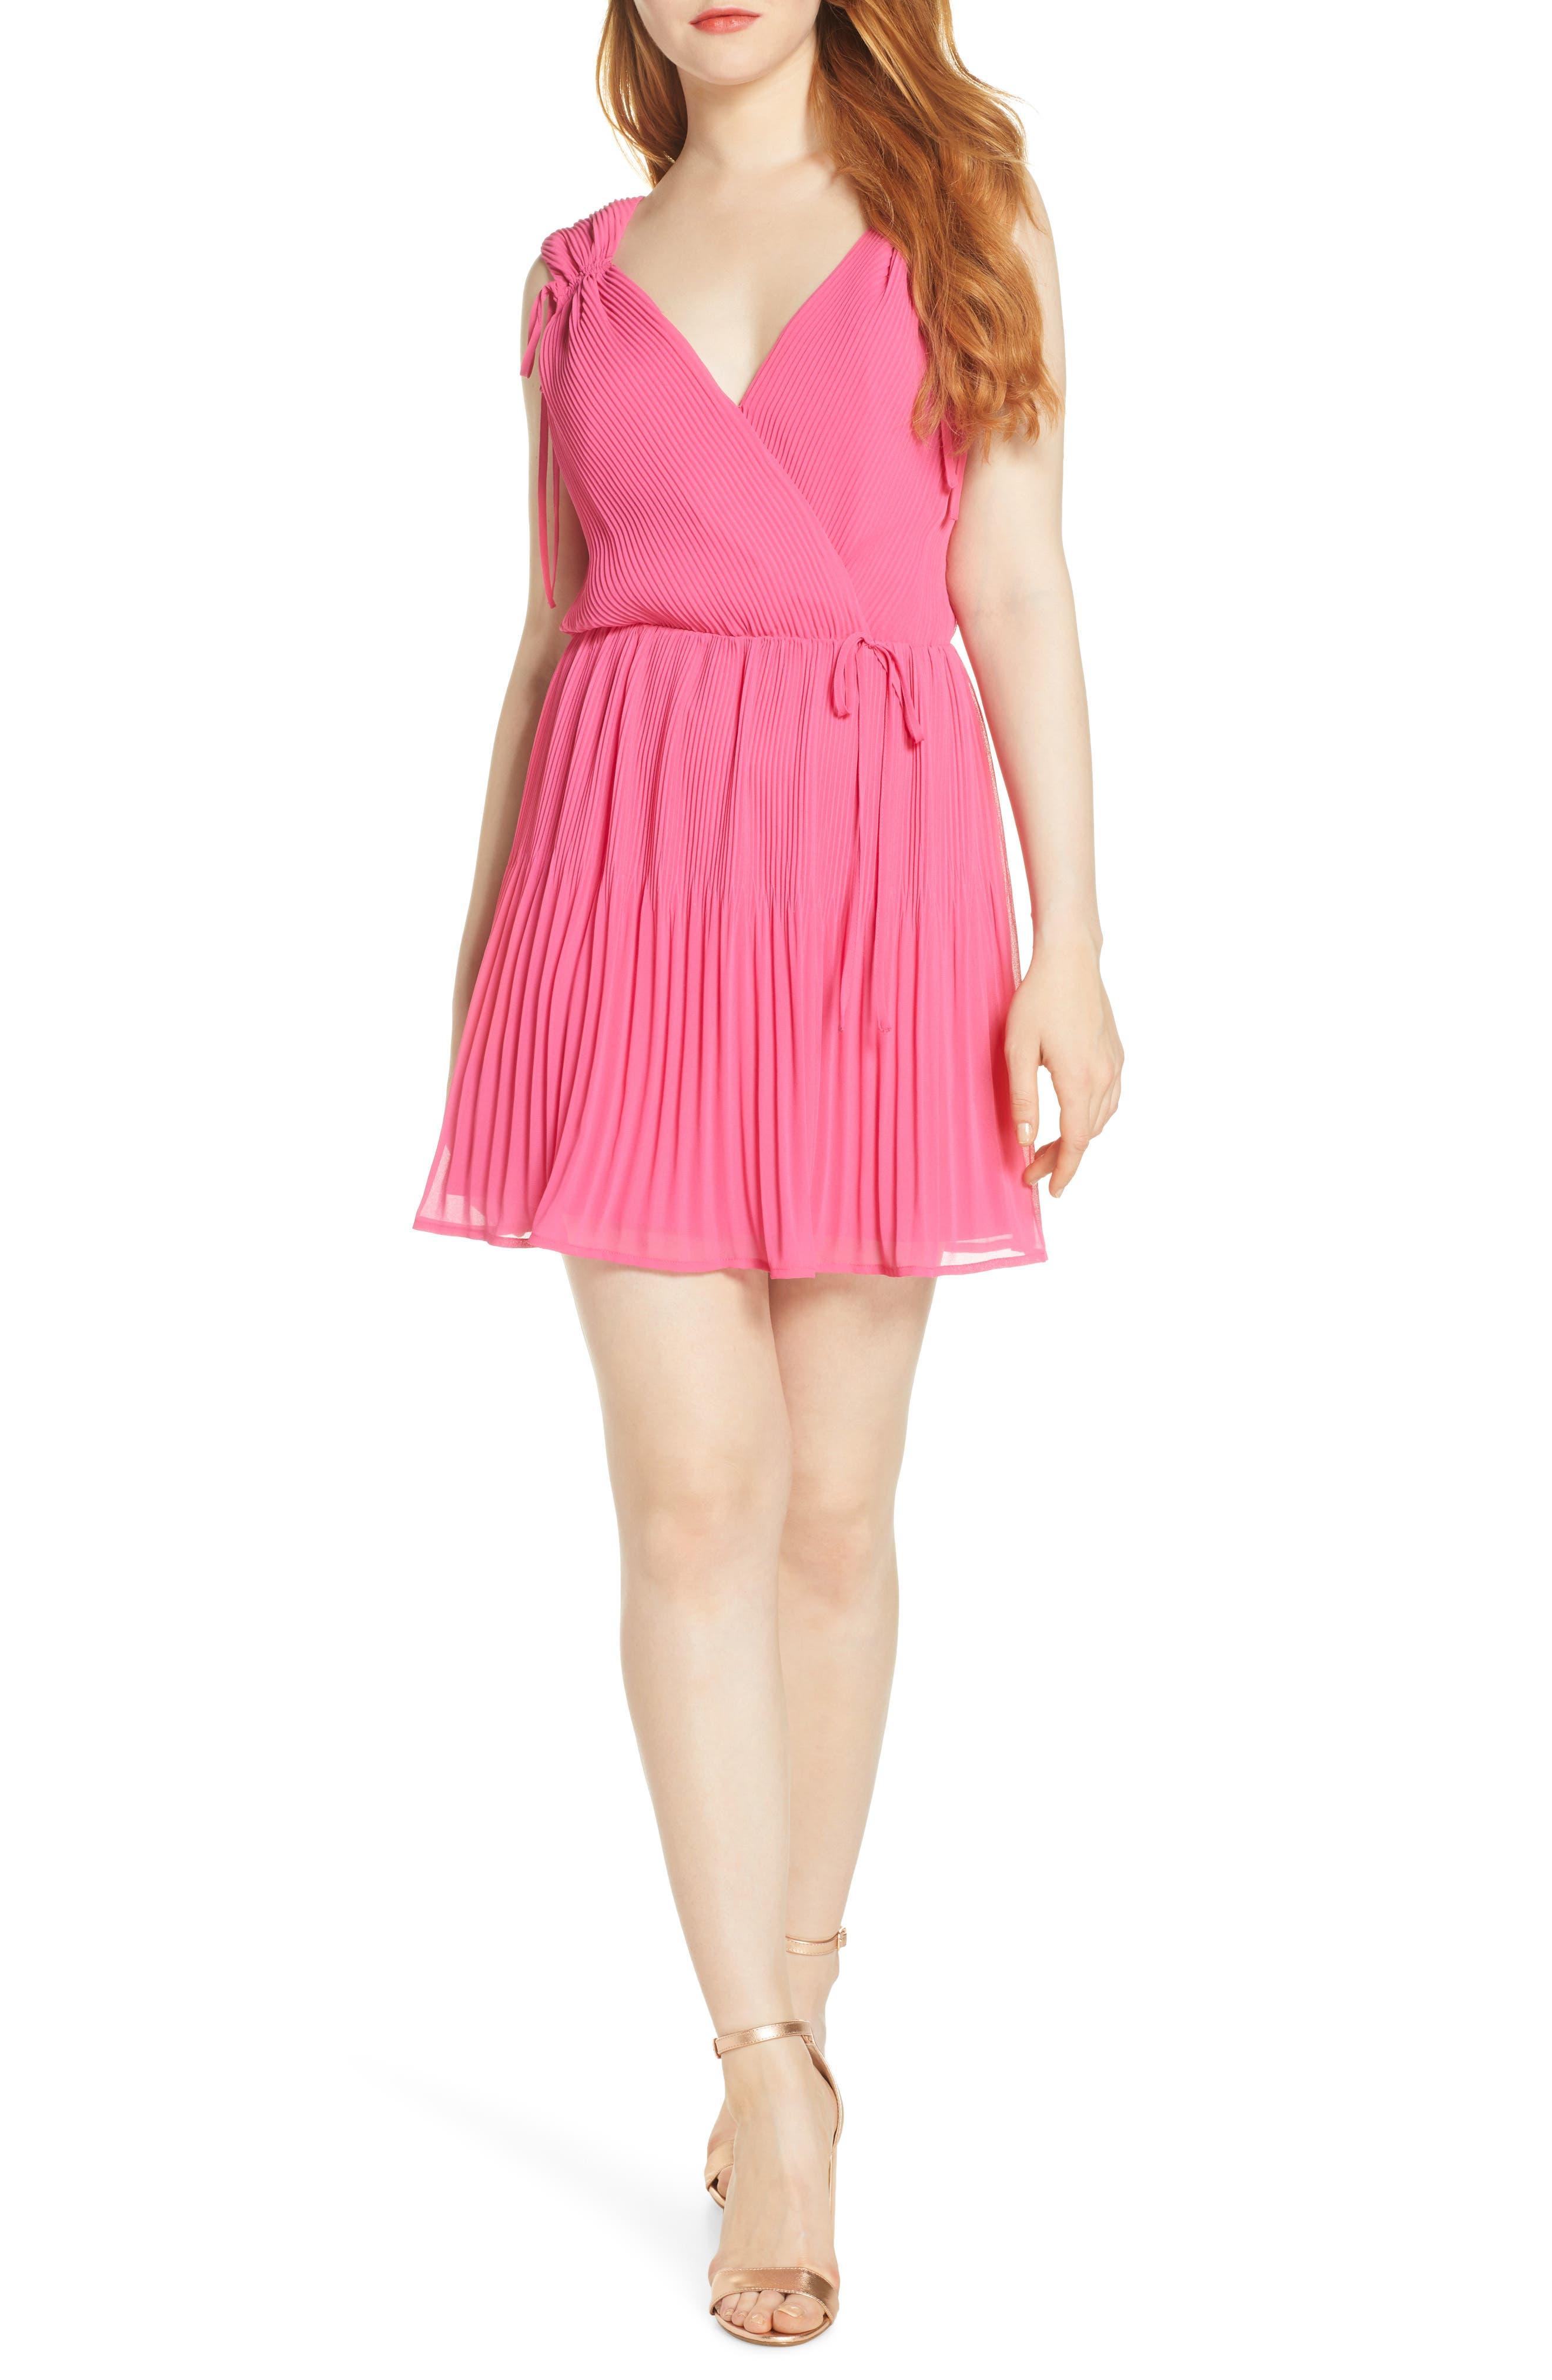 Ali & Jay X Dress Up Buttercup Plus One Minidress, Pink